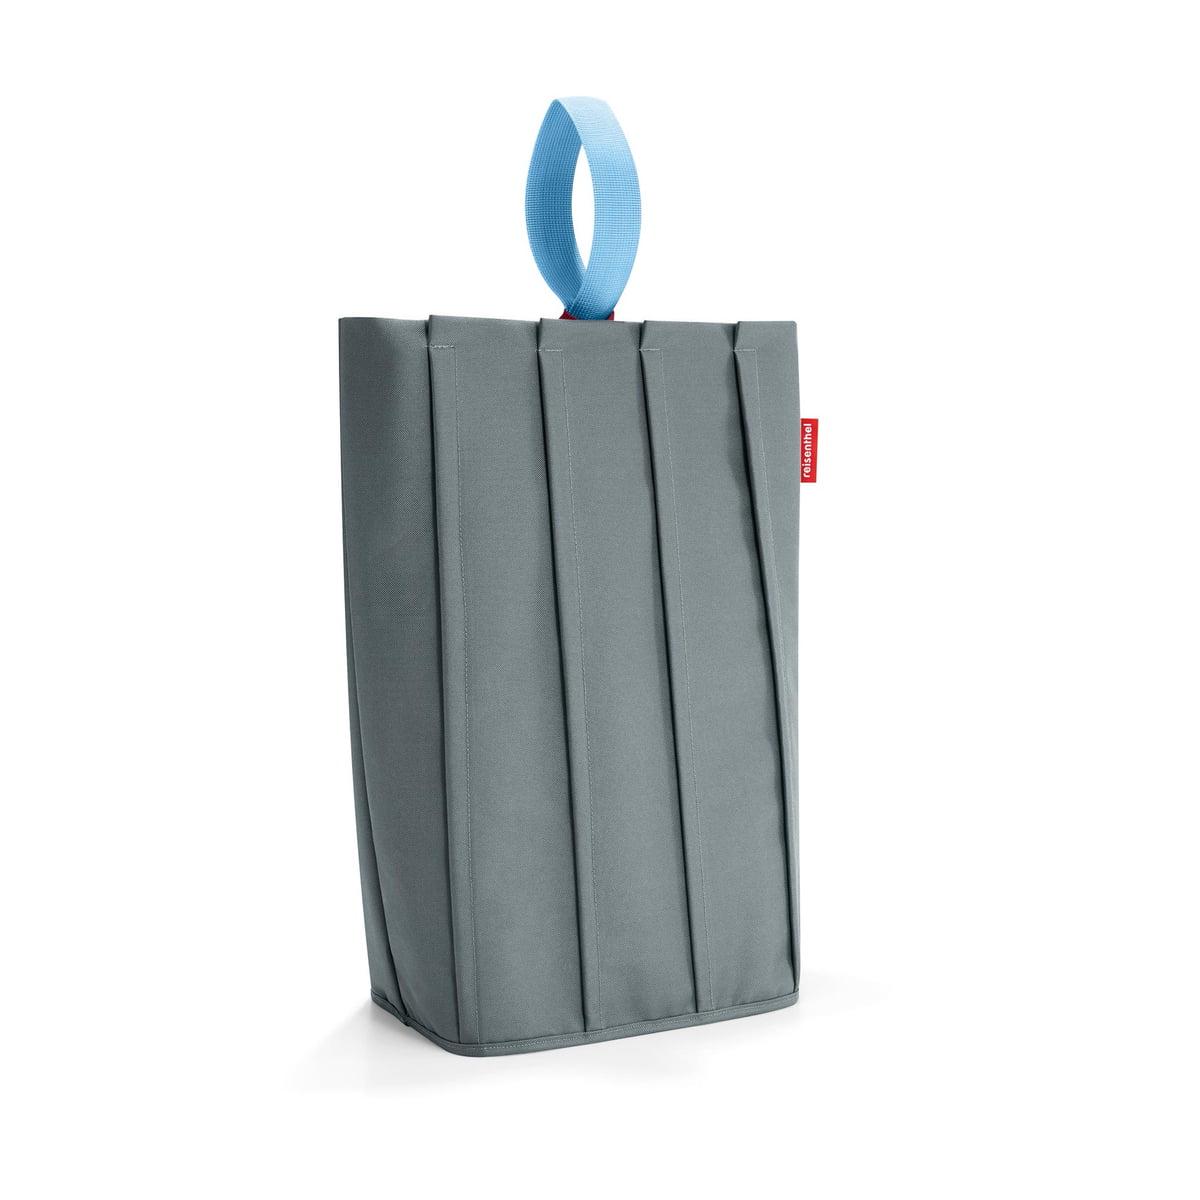 reisenthel accessoires reisenthel laundrybag m basalt. Black Bedroom Furniture Sets. Home Design Ideas